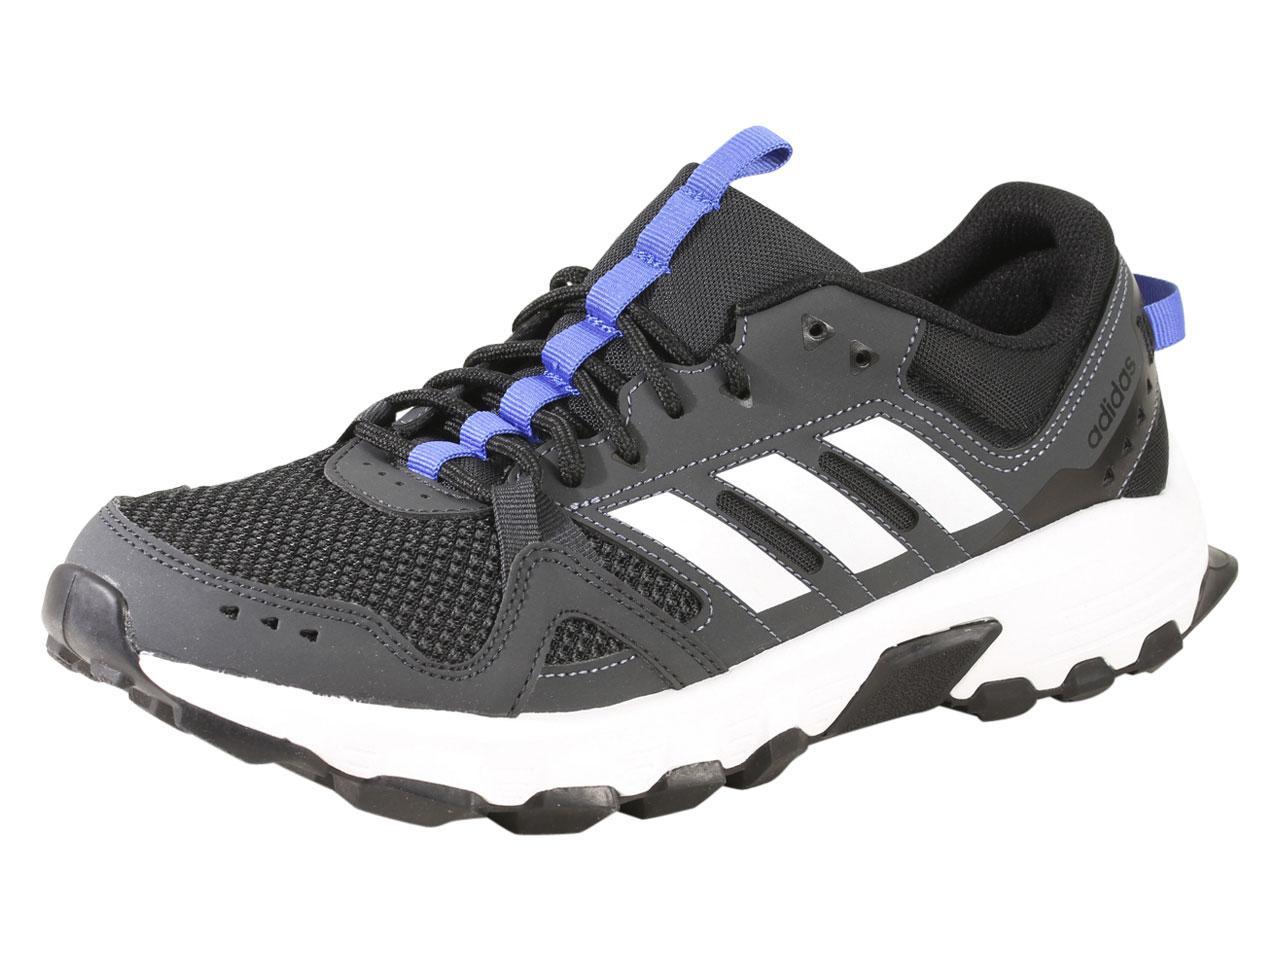 Adidas Men's Rockadia Trail Running Sneakers Shoes